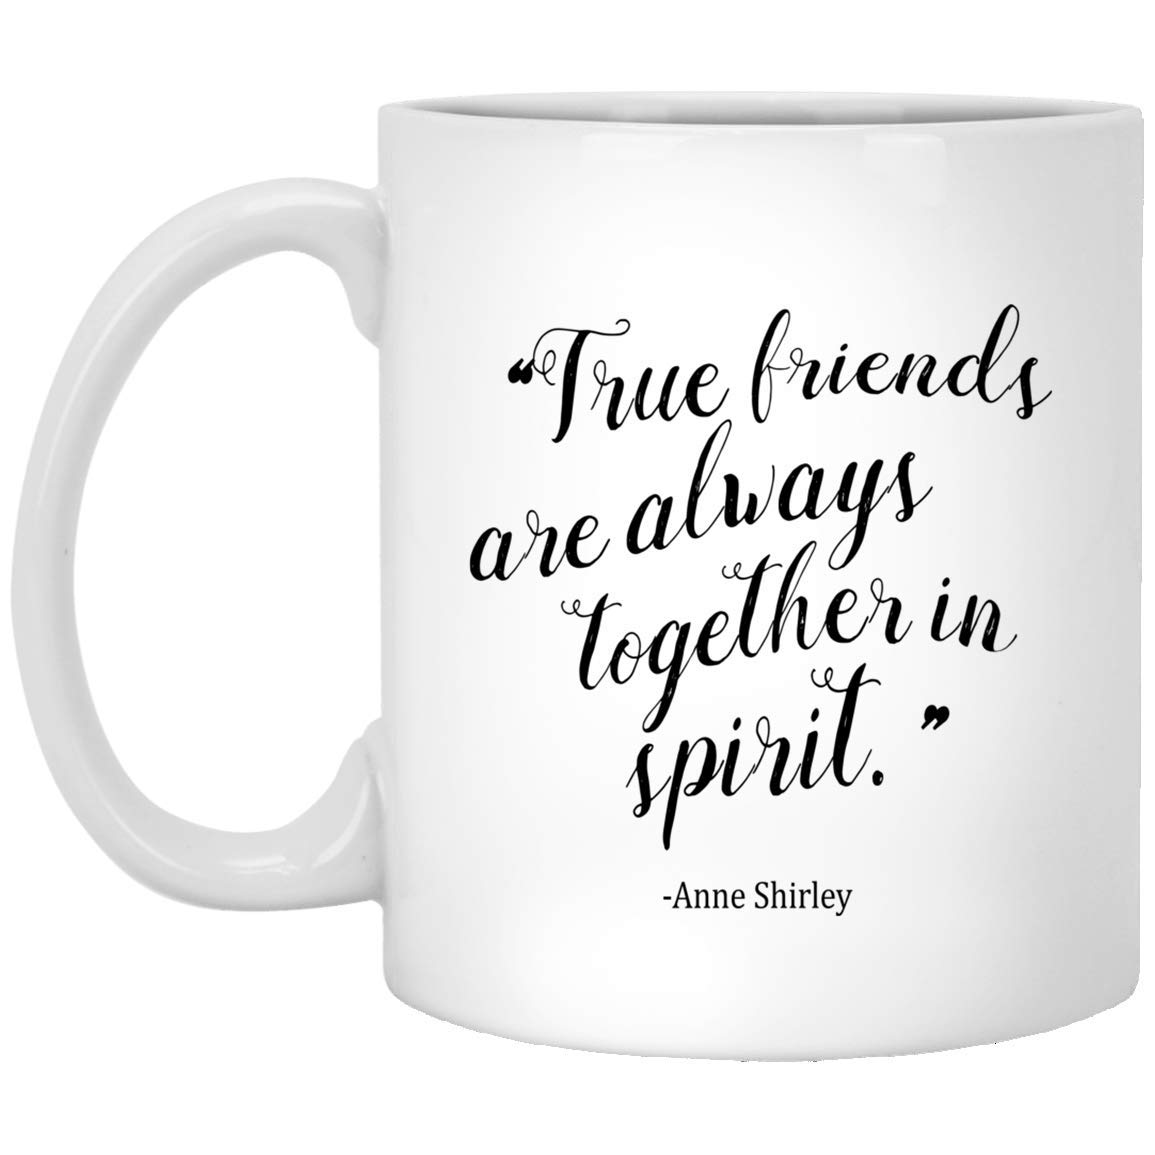 Friendship mug best friend Challenge the lowest price gift Fees free!! long distance friendship